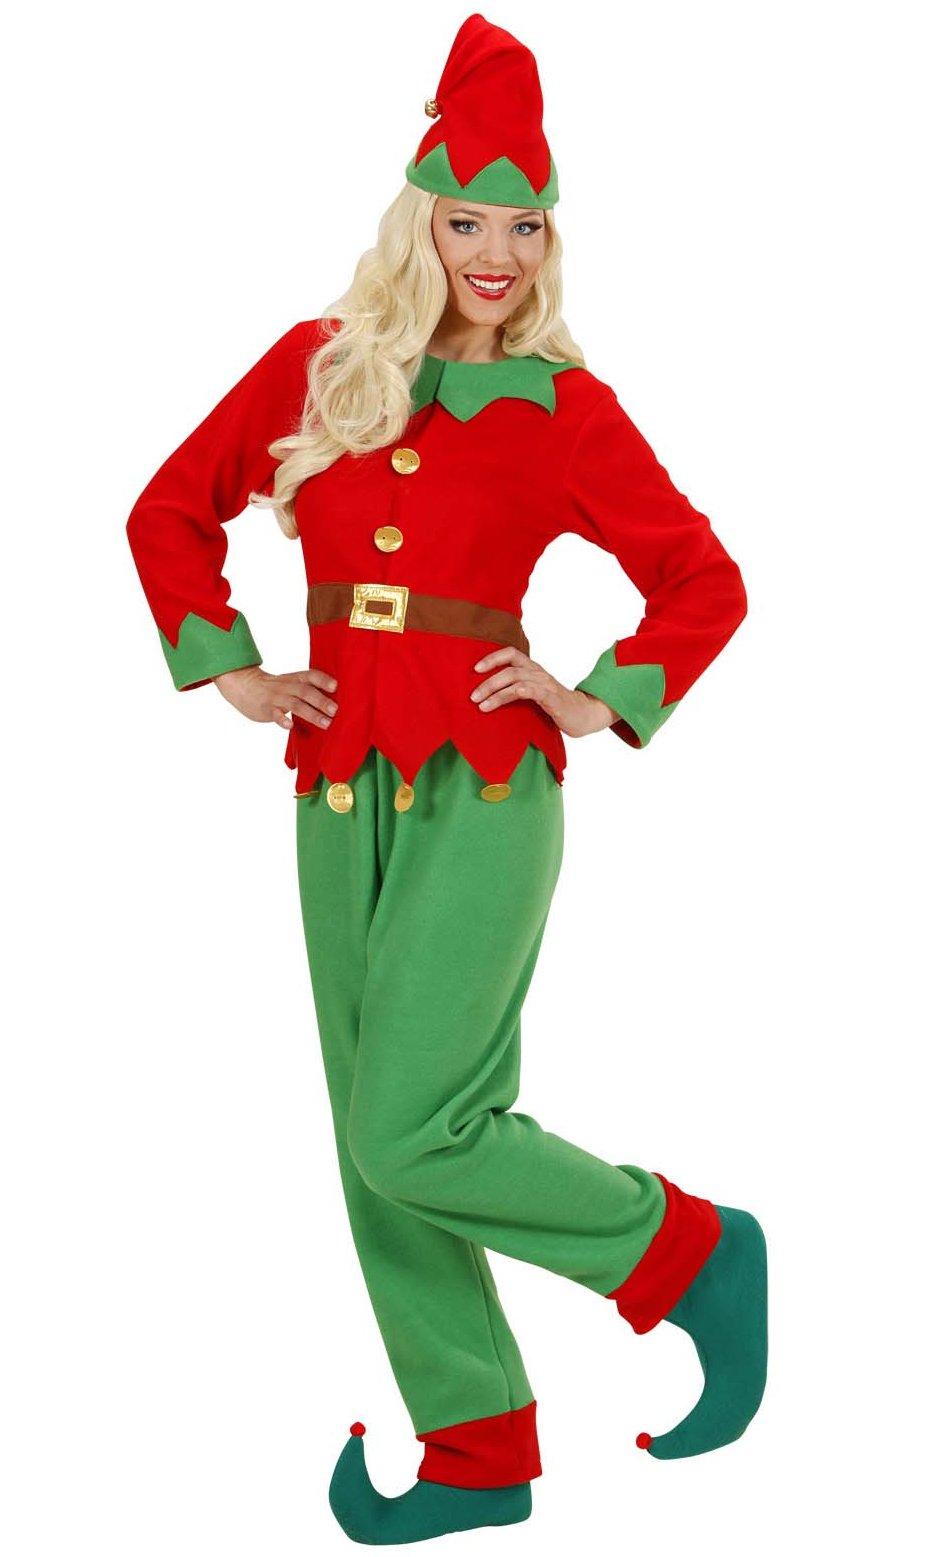 Elf-Costume-F4-2